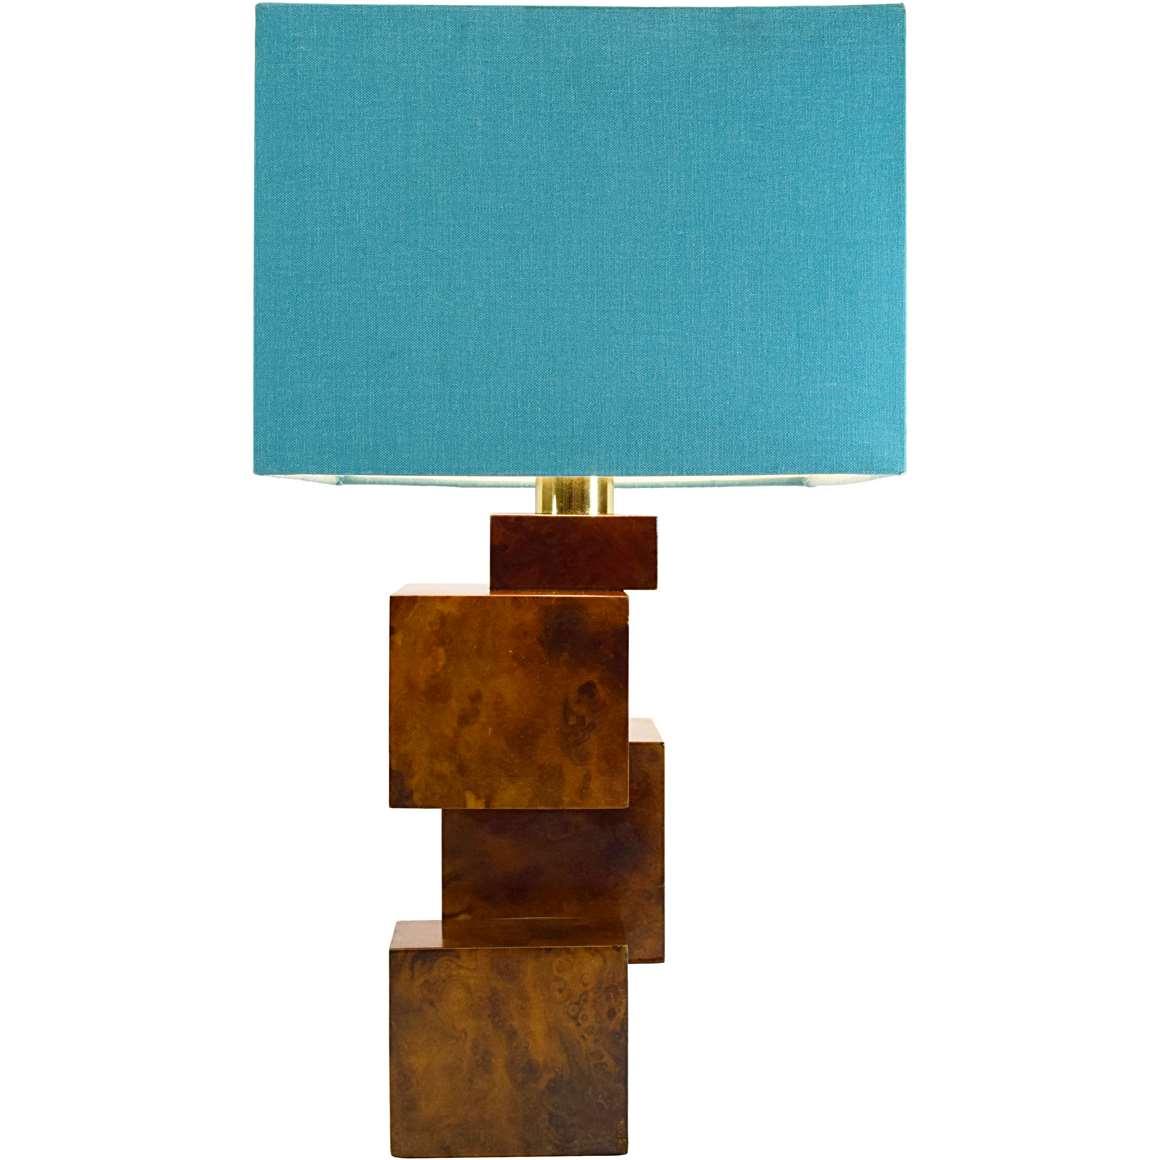 Burr Walnut Cityscape Table Lamp